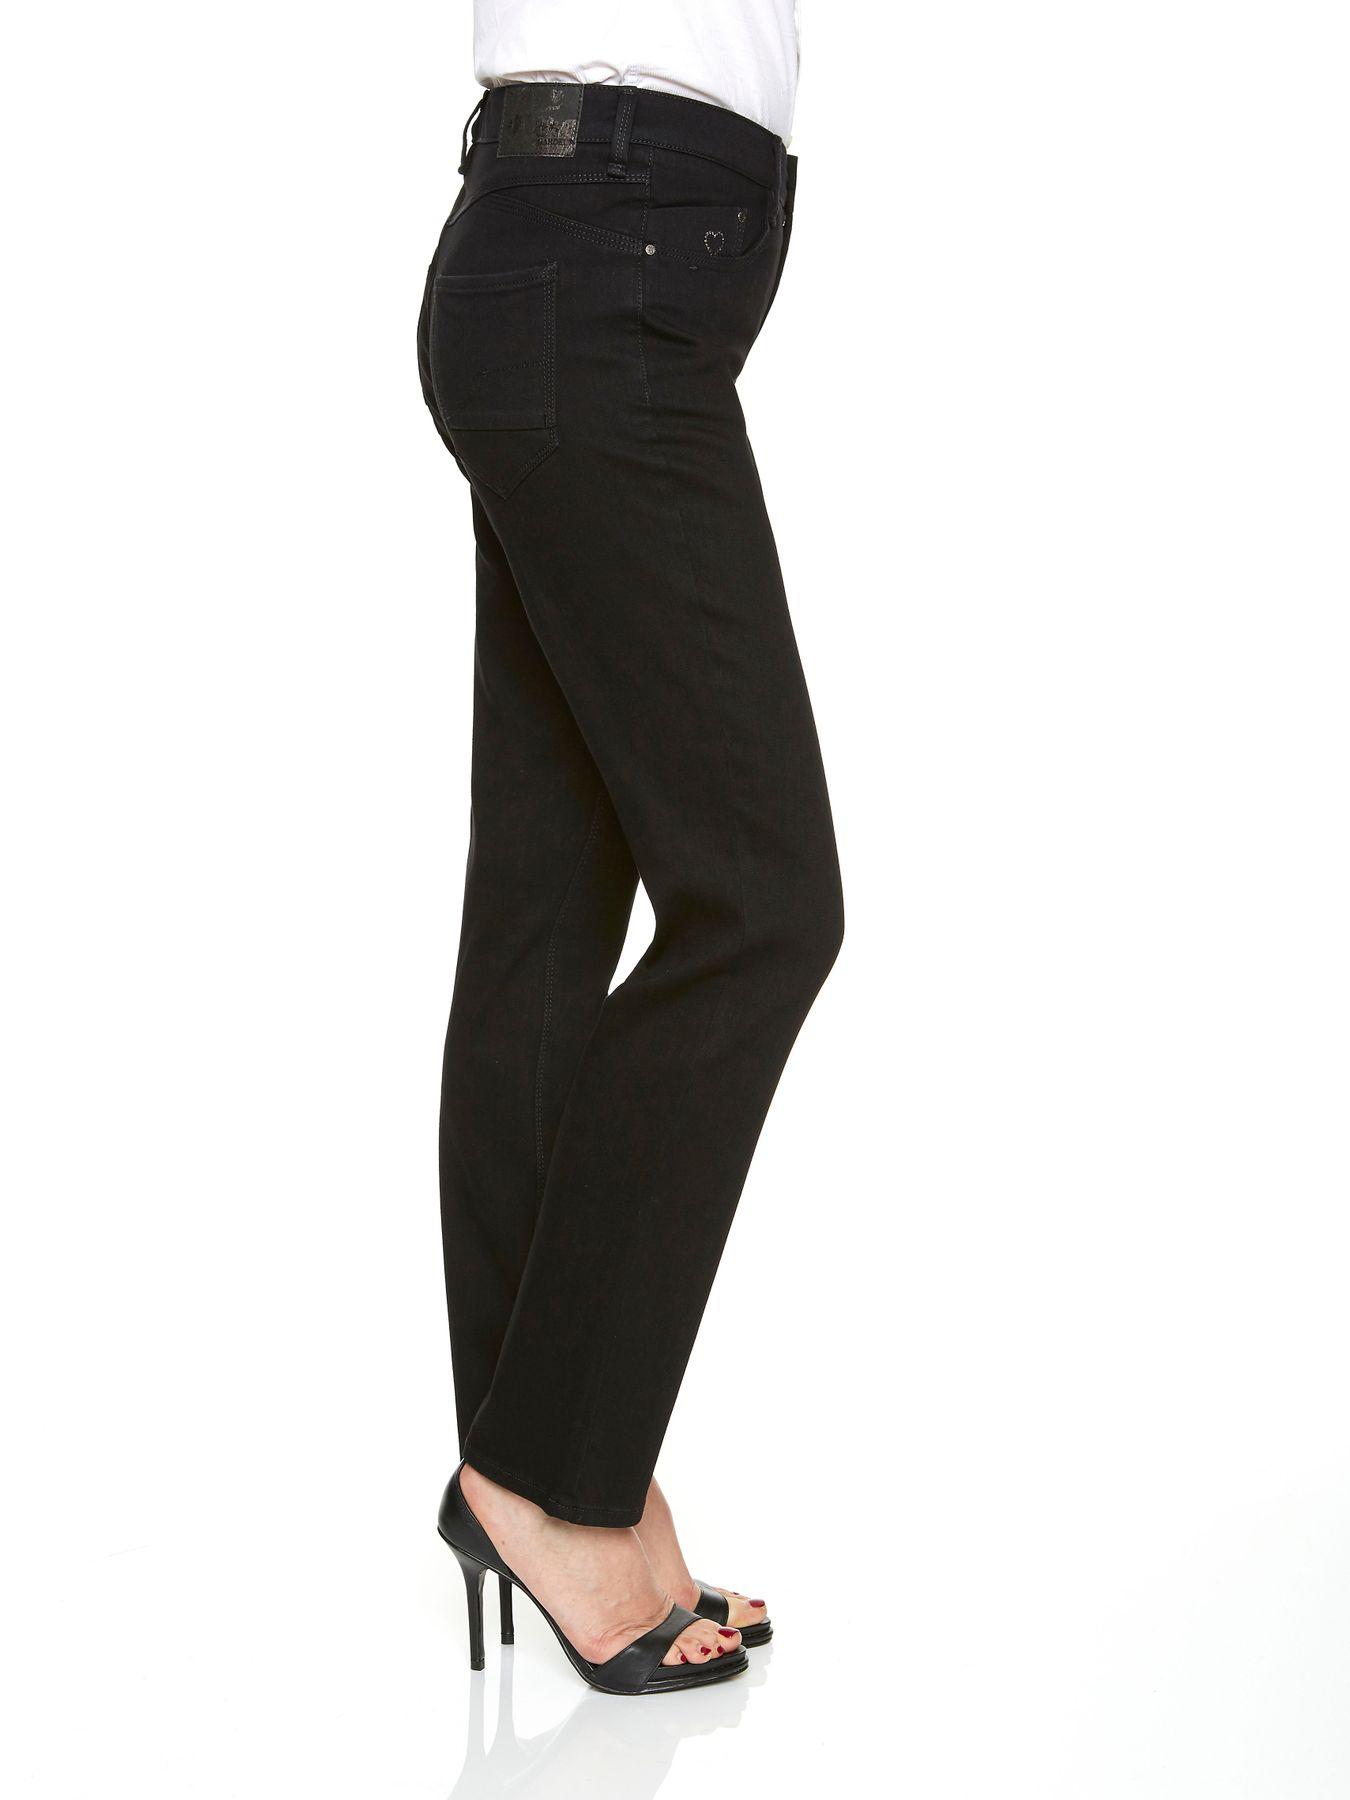 Atelier Gardeur - Feminine Fit - Damen 5-Pocket, Ciara (061854) – Bild 2